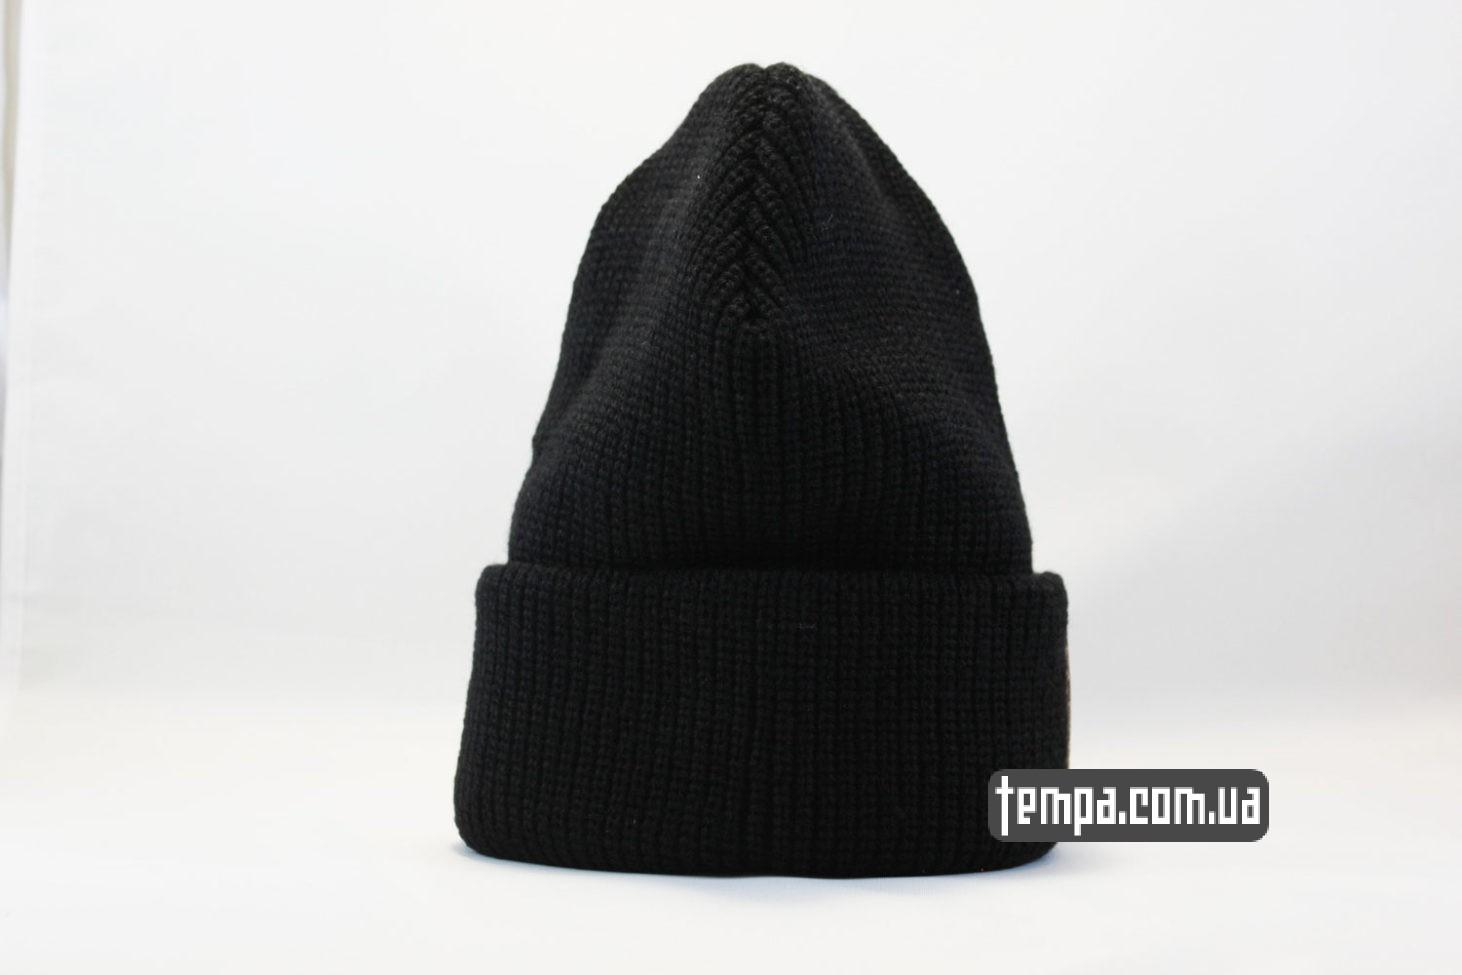 стасси Украина шапка beanie STUSSY New York Los Angeles Tokyo купить магазин Украина